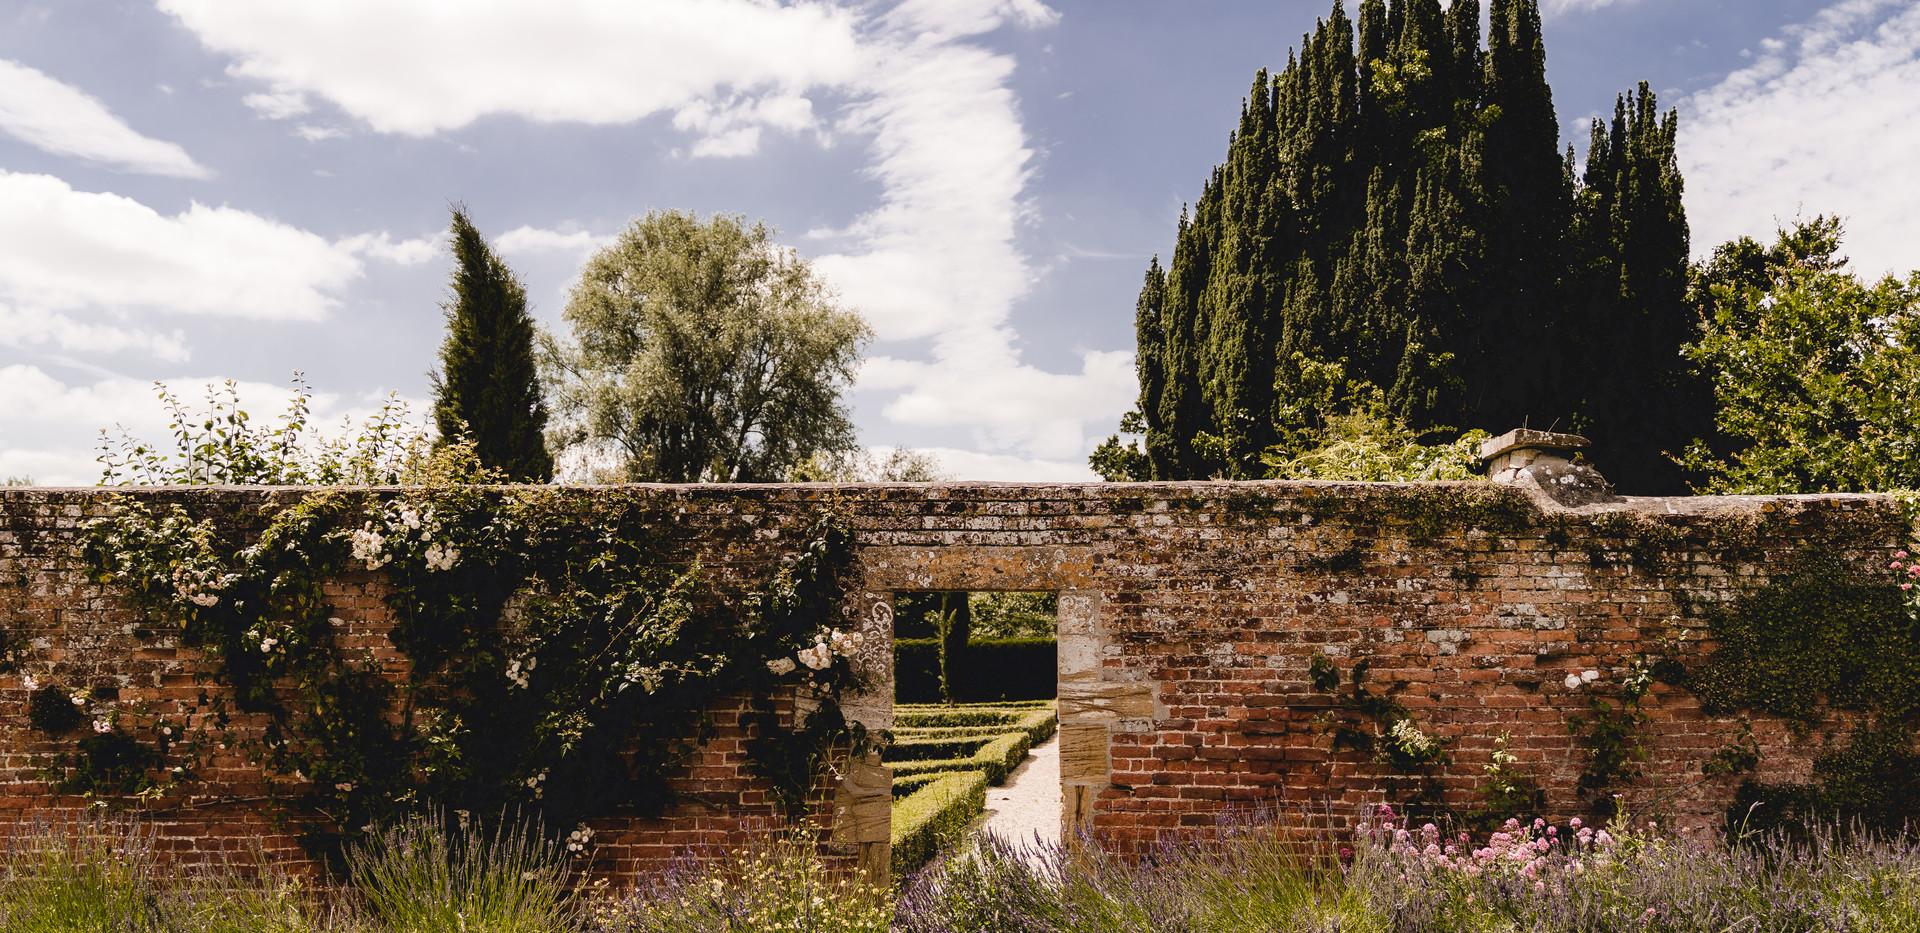 The romantic Walled Garden